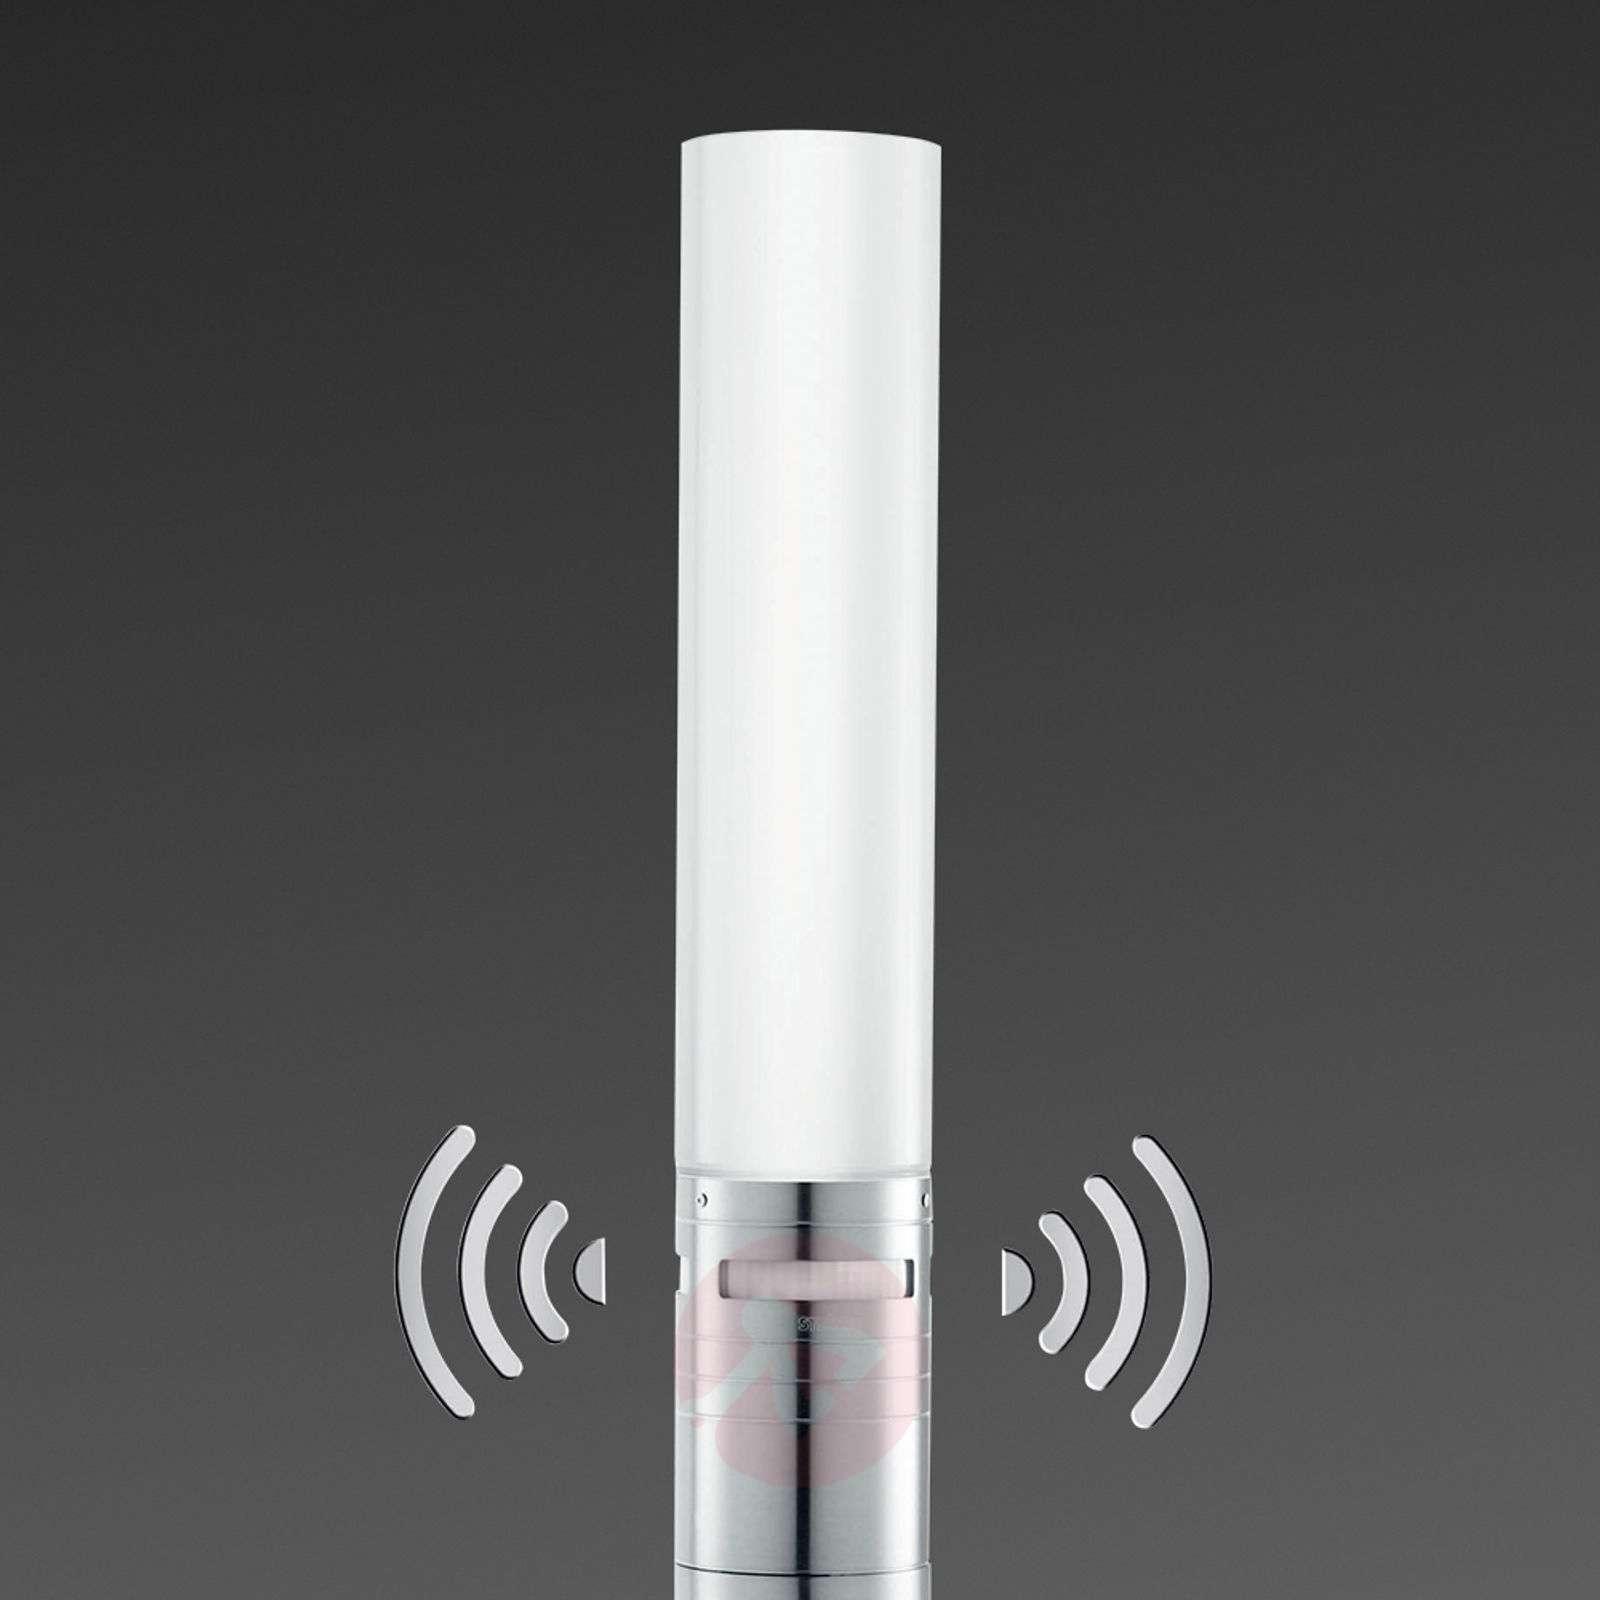 Sensor LED path light GL60 LED-8505663-02